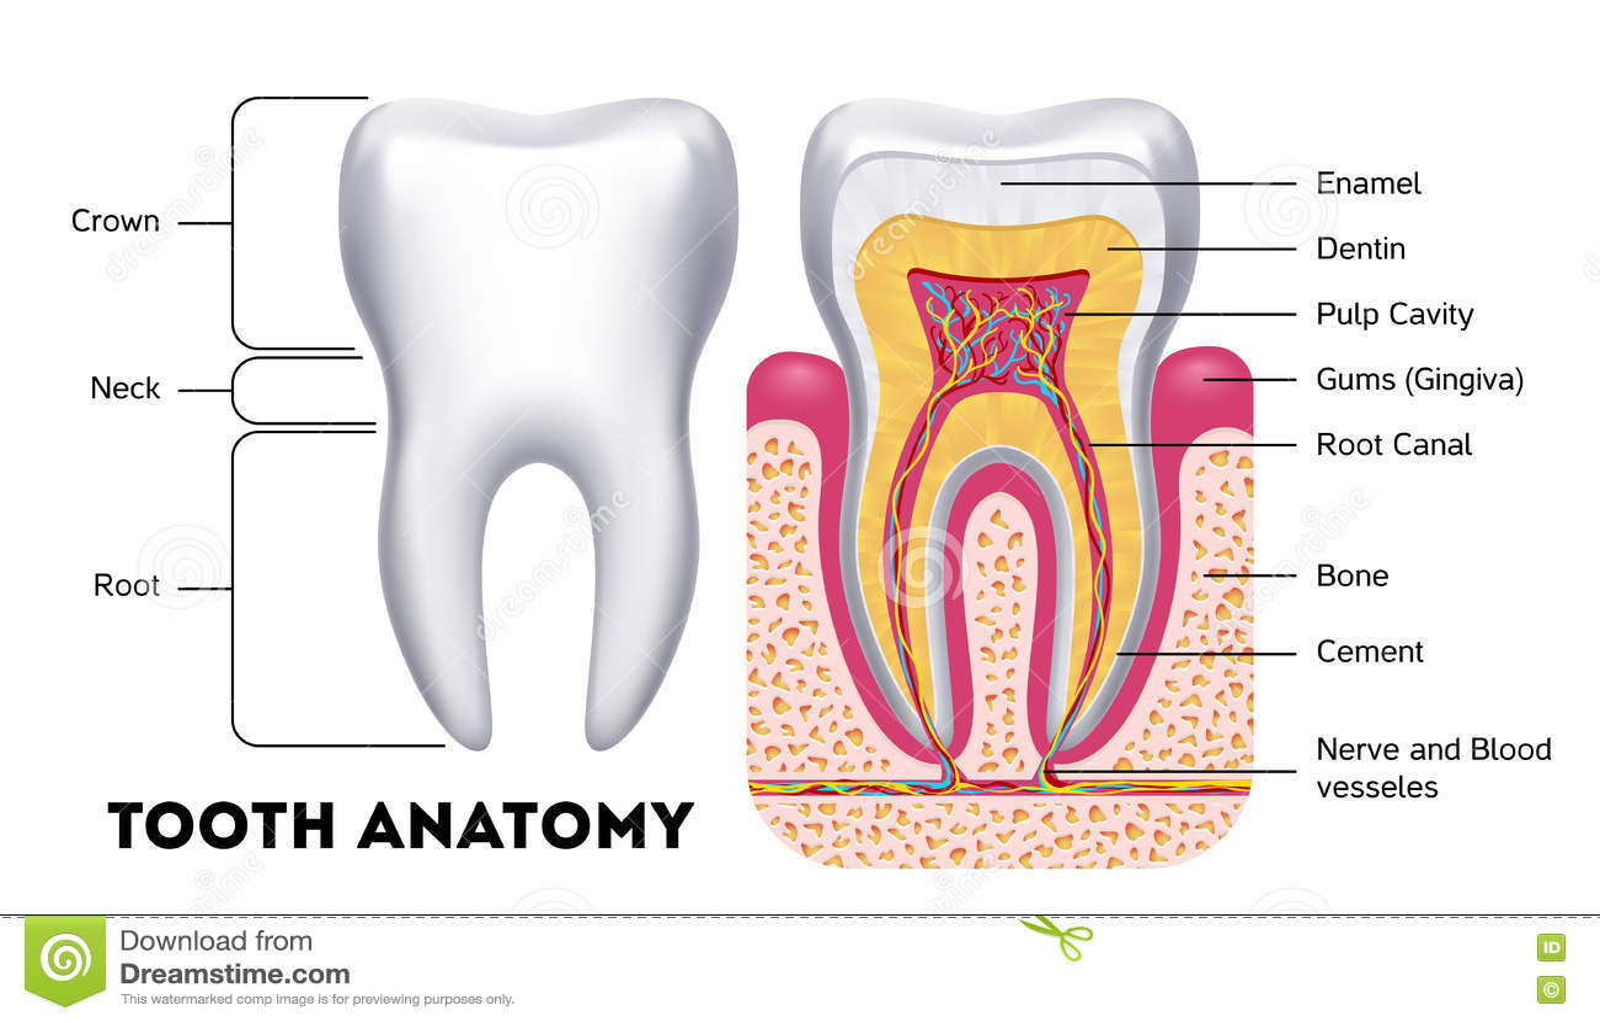 human jaw bone diagram human head diagram   elsavadorla oral cavity anatomy diagram Throat Anatomy Diagram